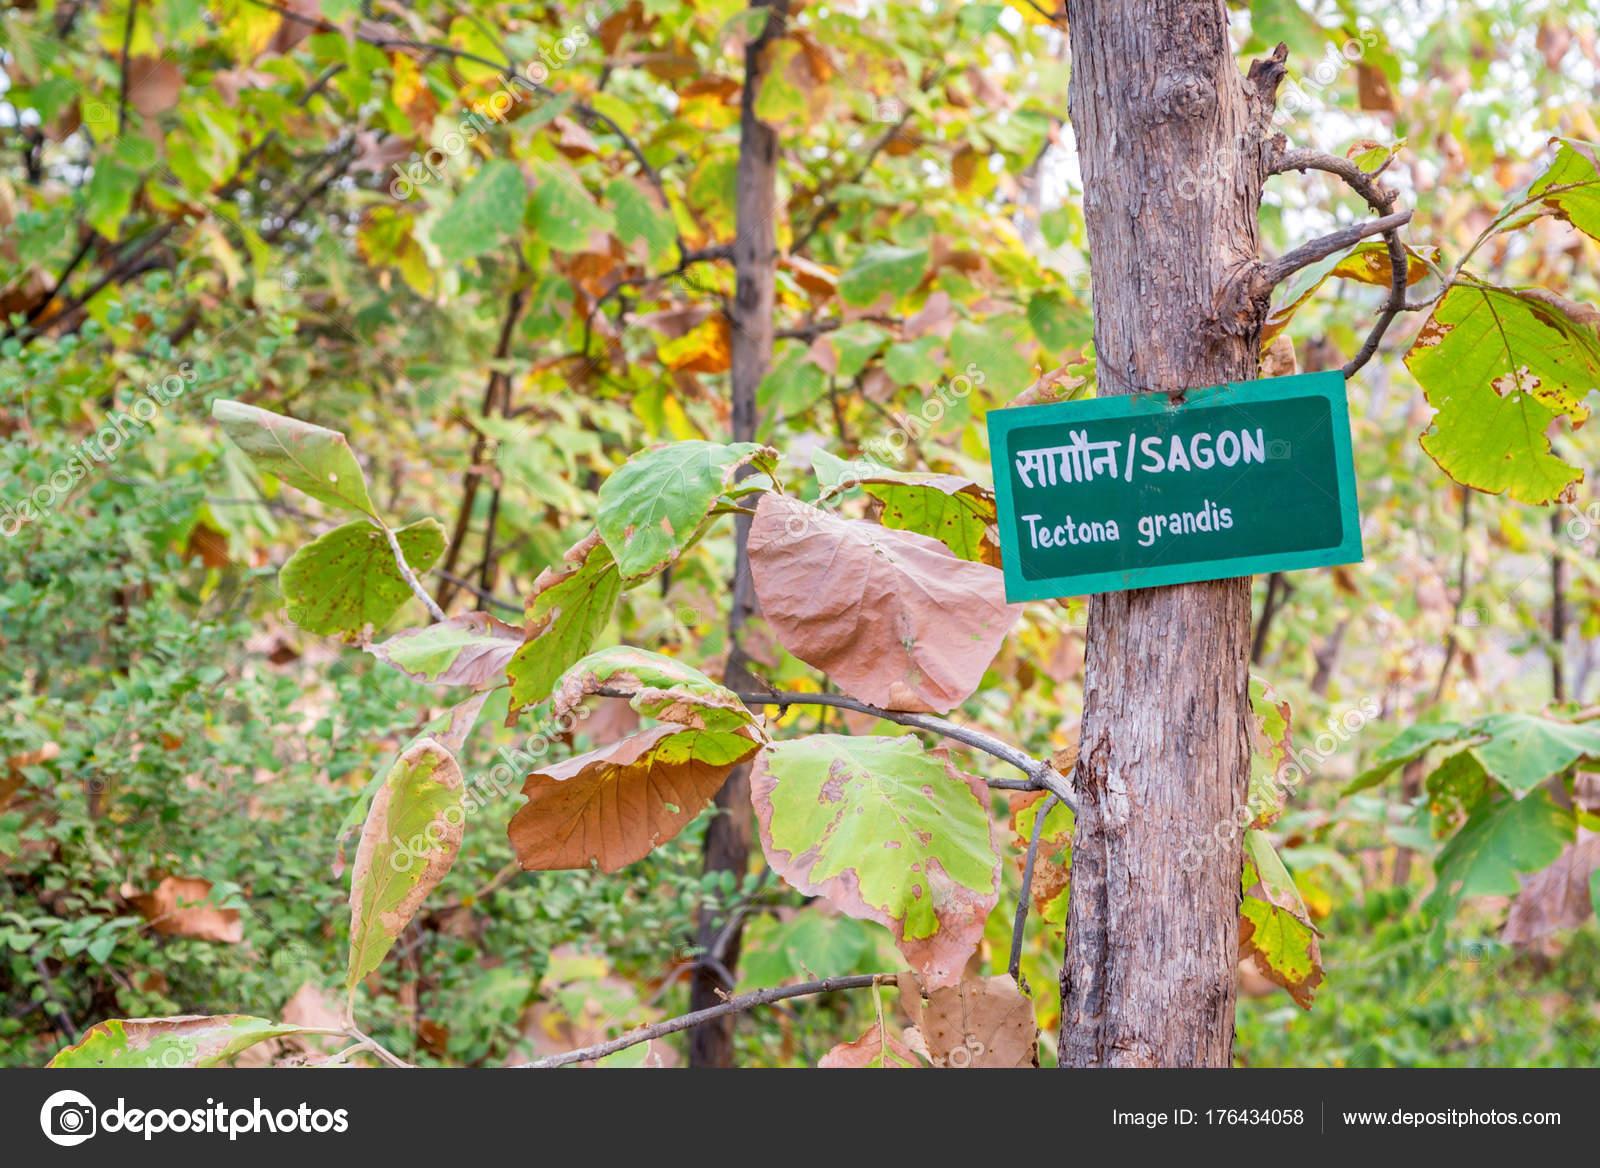 Teakbaum  Teak-Baum oder Tectona Grandis im arboretum — Stockfoto ...